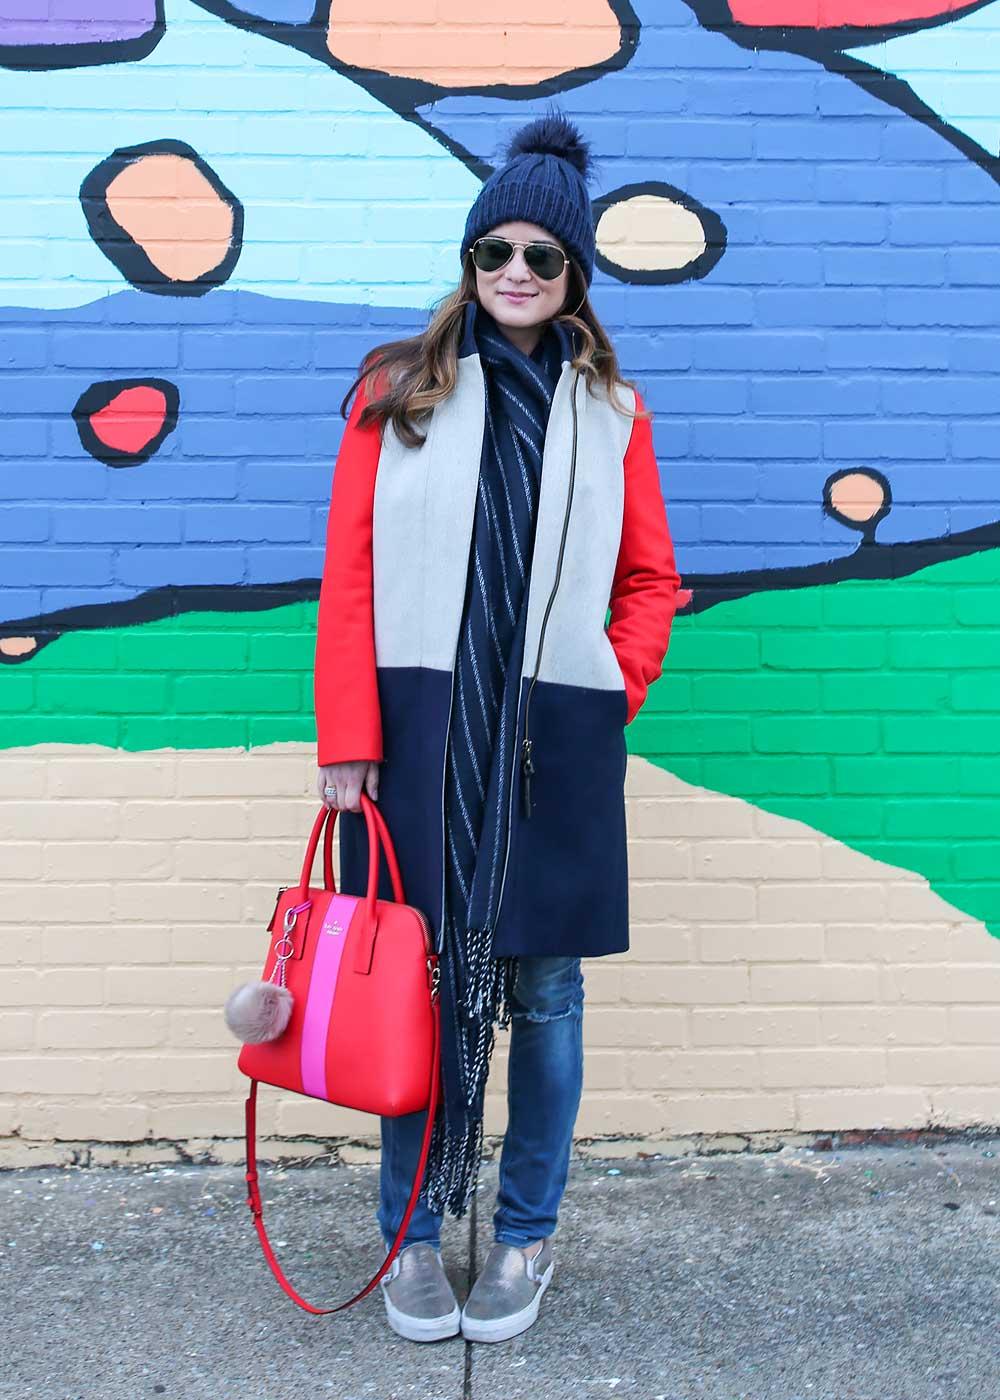 chicago based colorful fashion blogger